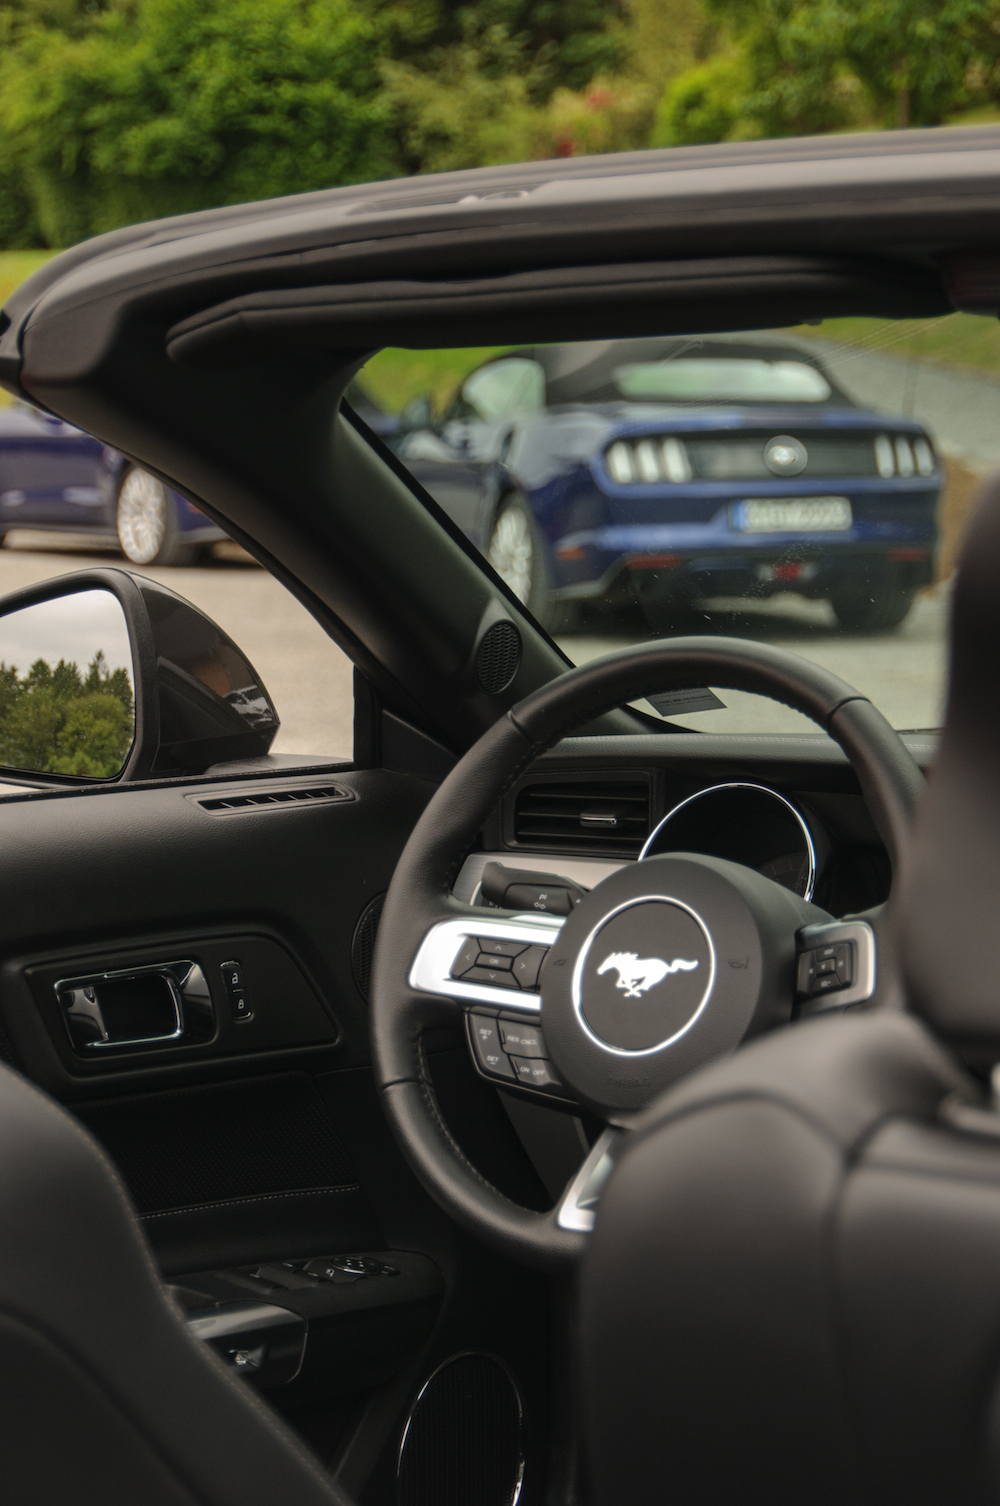 FordMustang-europa_2015_006